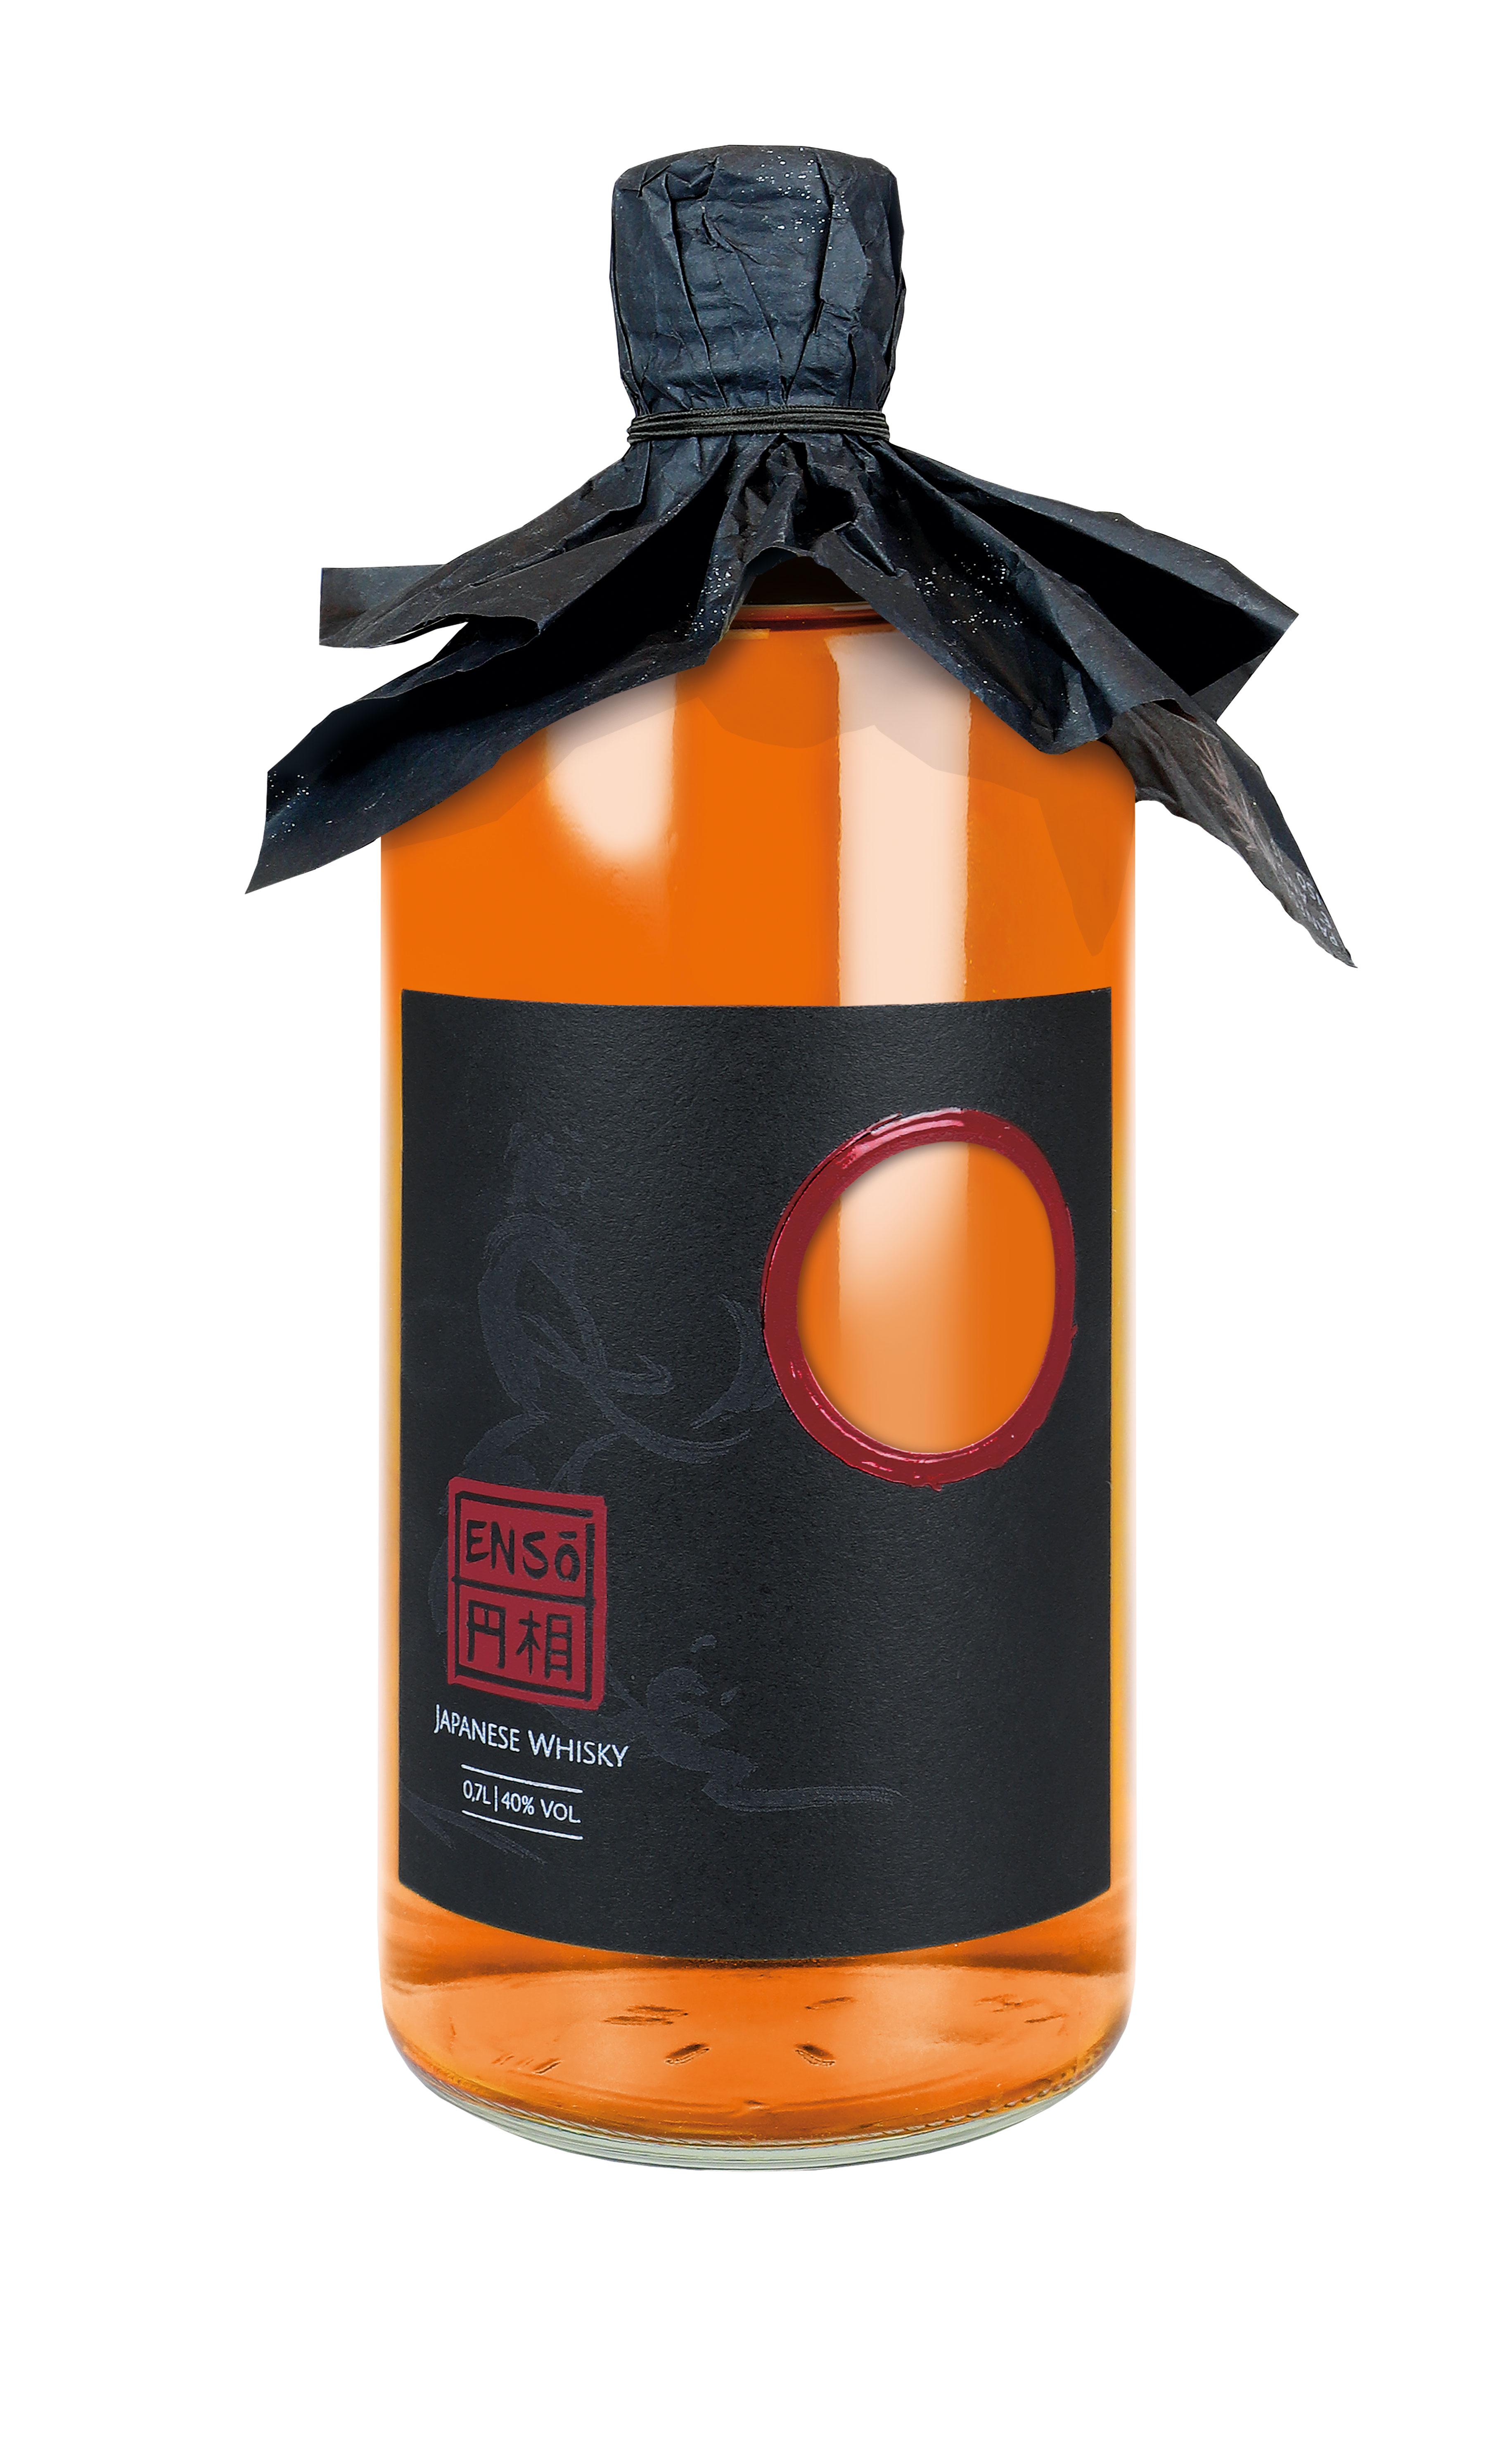 Enso Pot Still Blend Whisky 0,7l (40% Vol) japanischer Whiskey - [Enthält Sulfite]